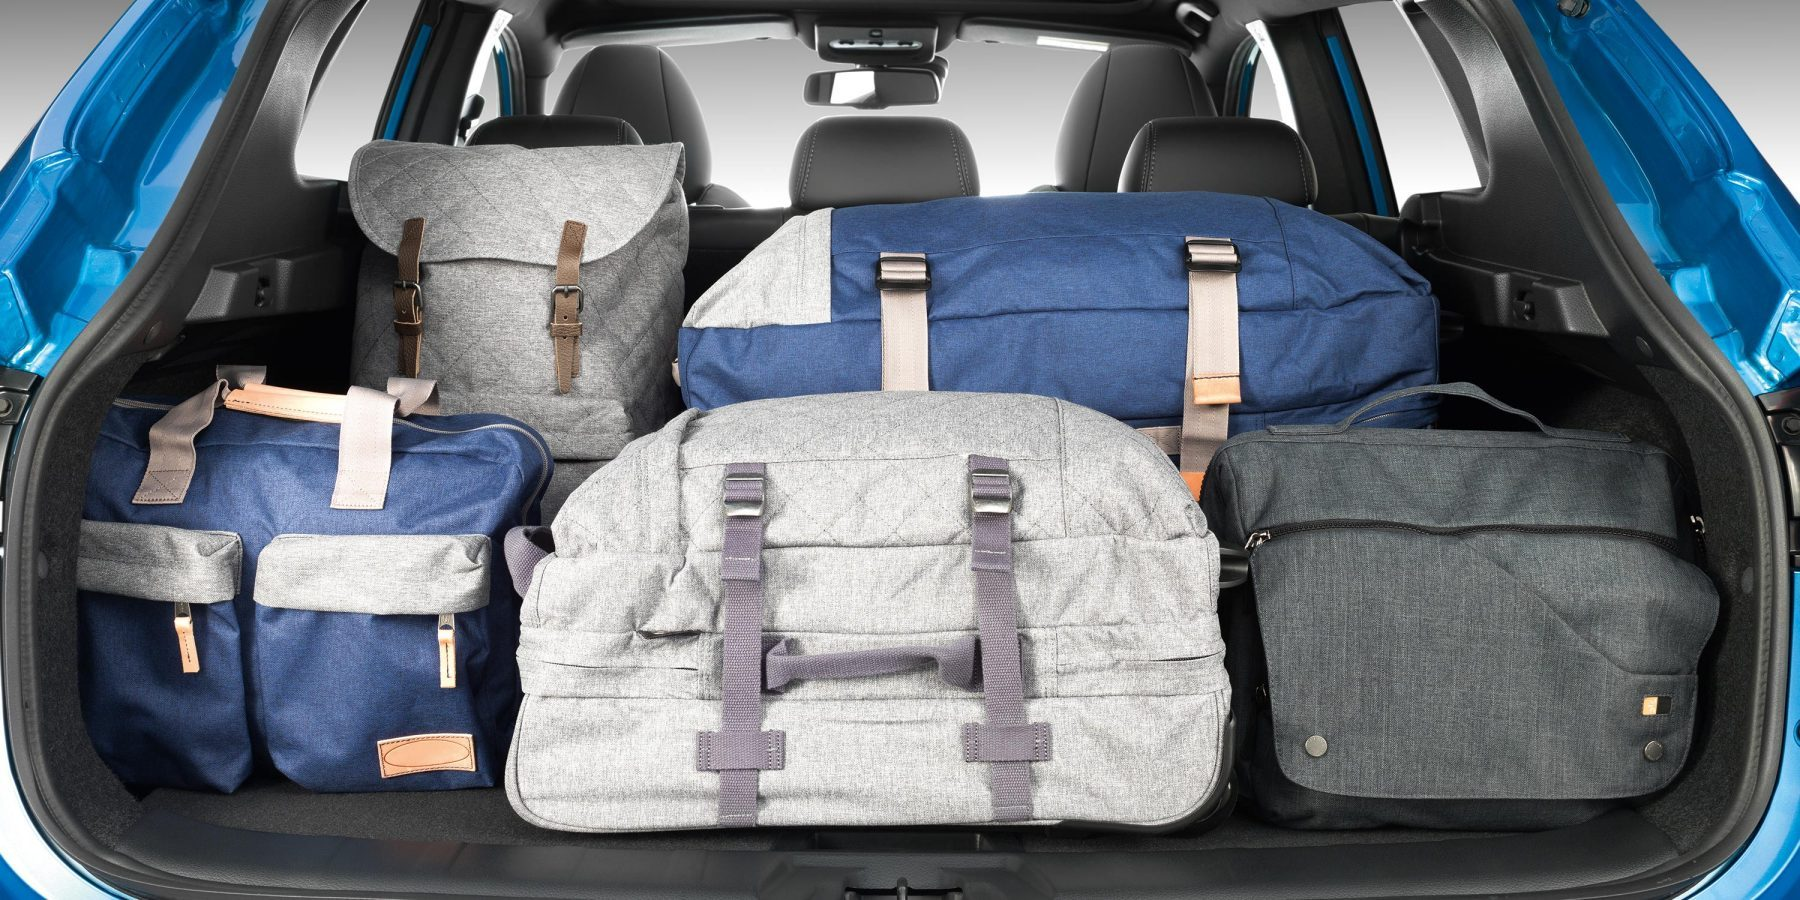 Конфигурация коробки багажника в Nissan QASHQAI